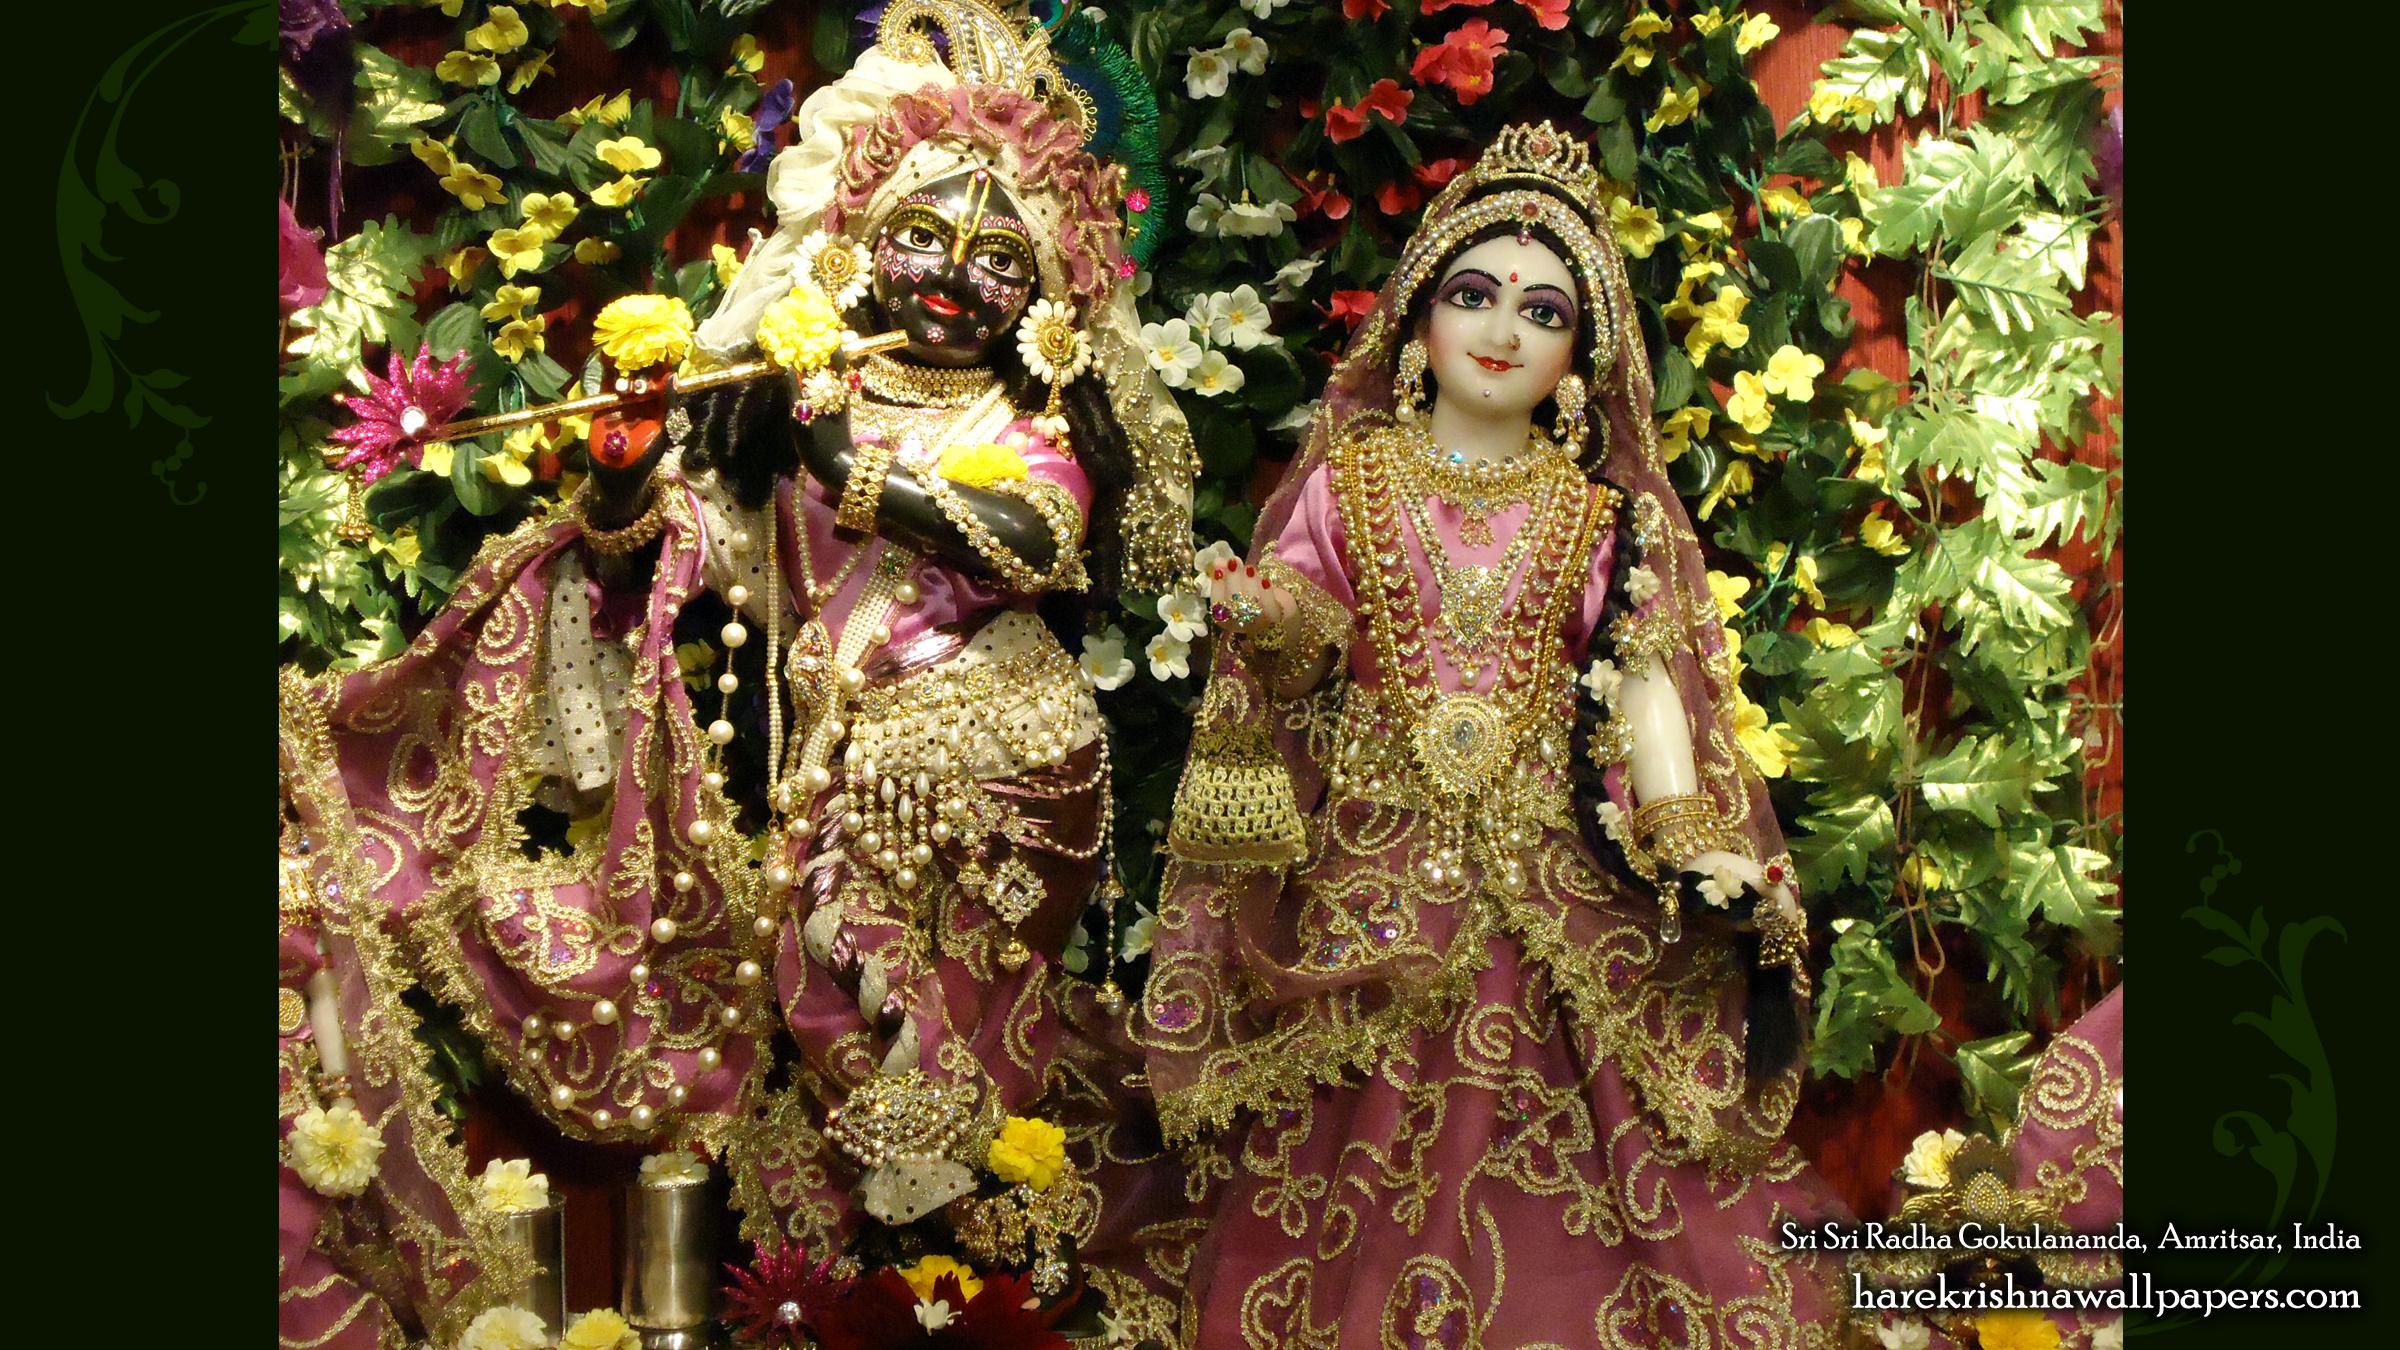 Sri Sri Radha Gokulananda Wallpaper (003) Size 2400x1350 Download